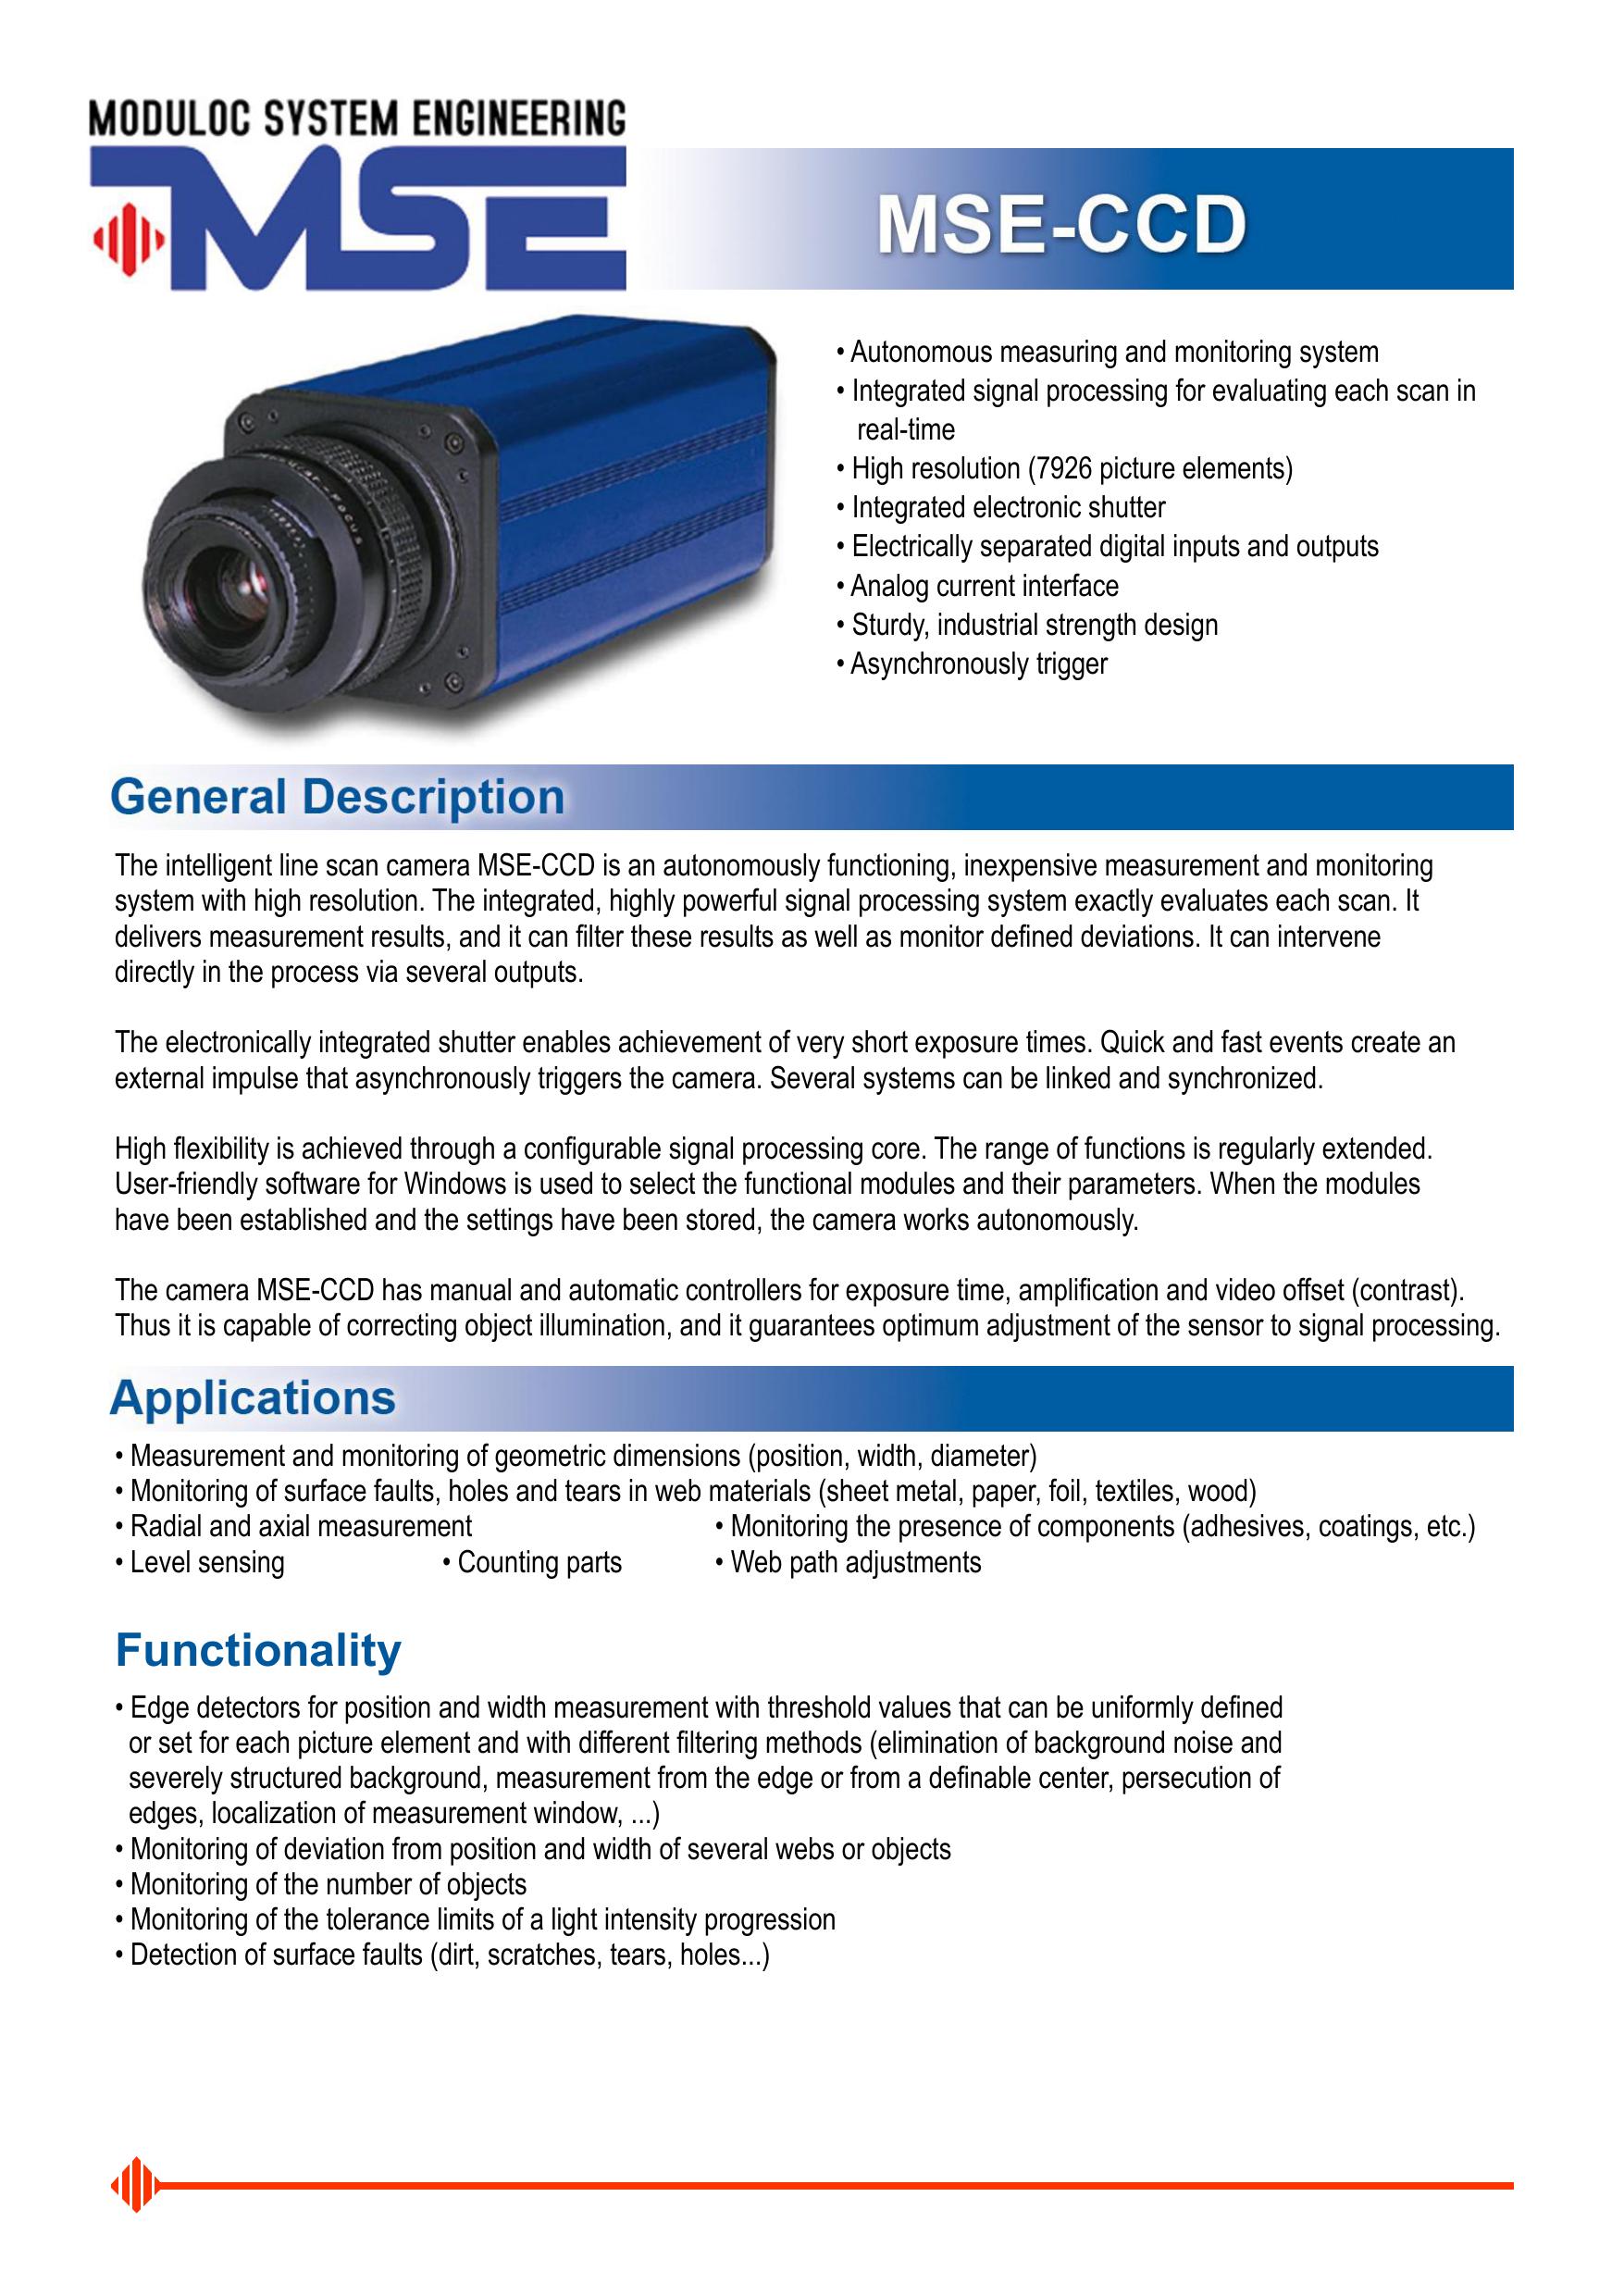 Functionality - MSE - Moduloc System Engineering | manualzz com